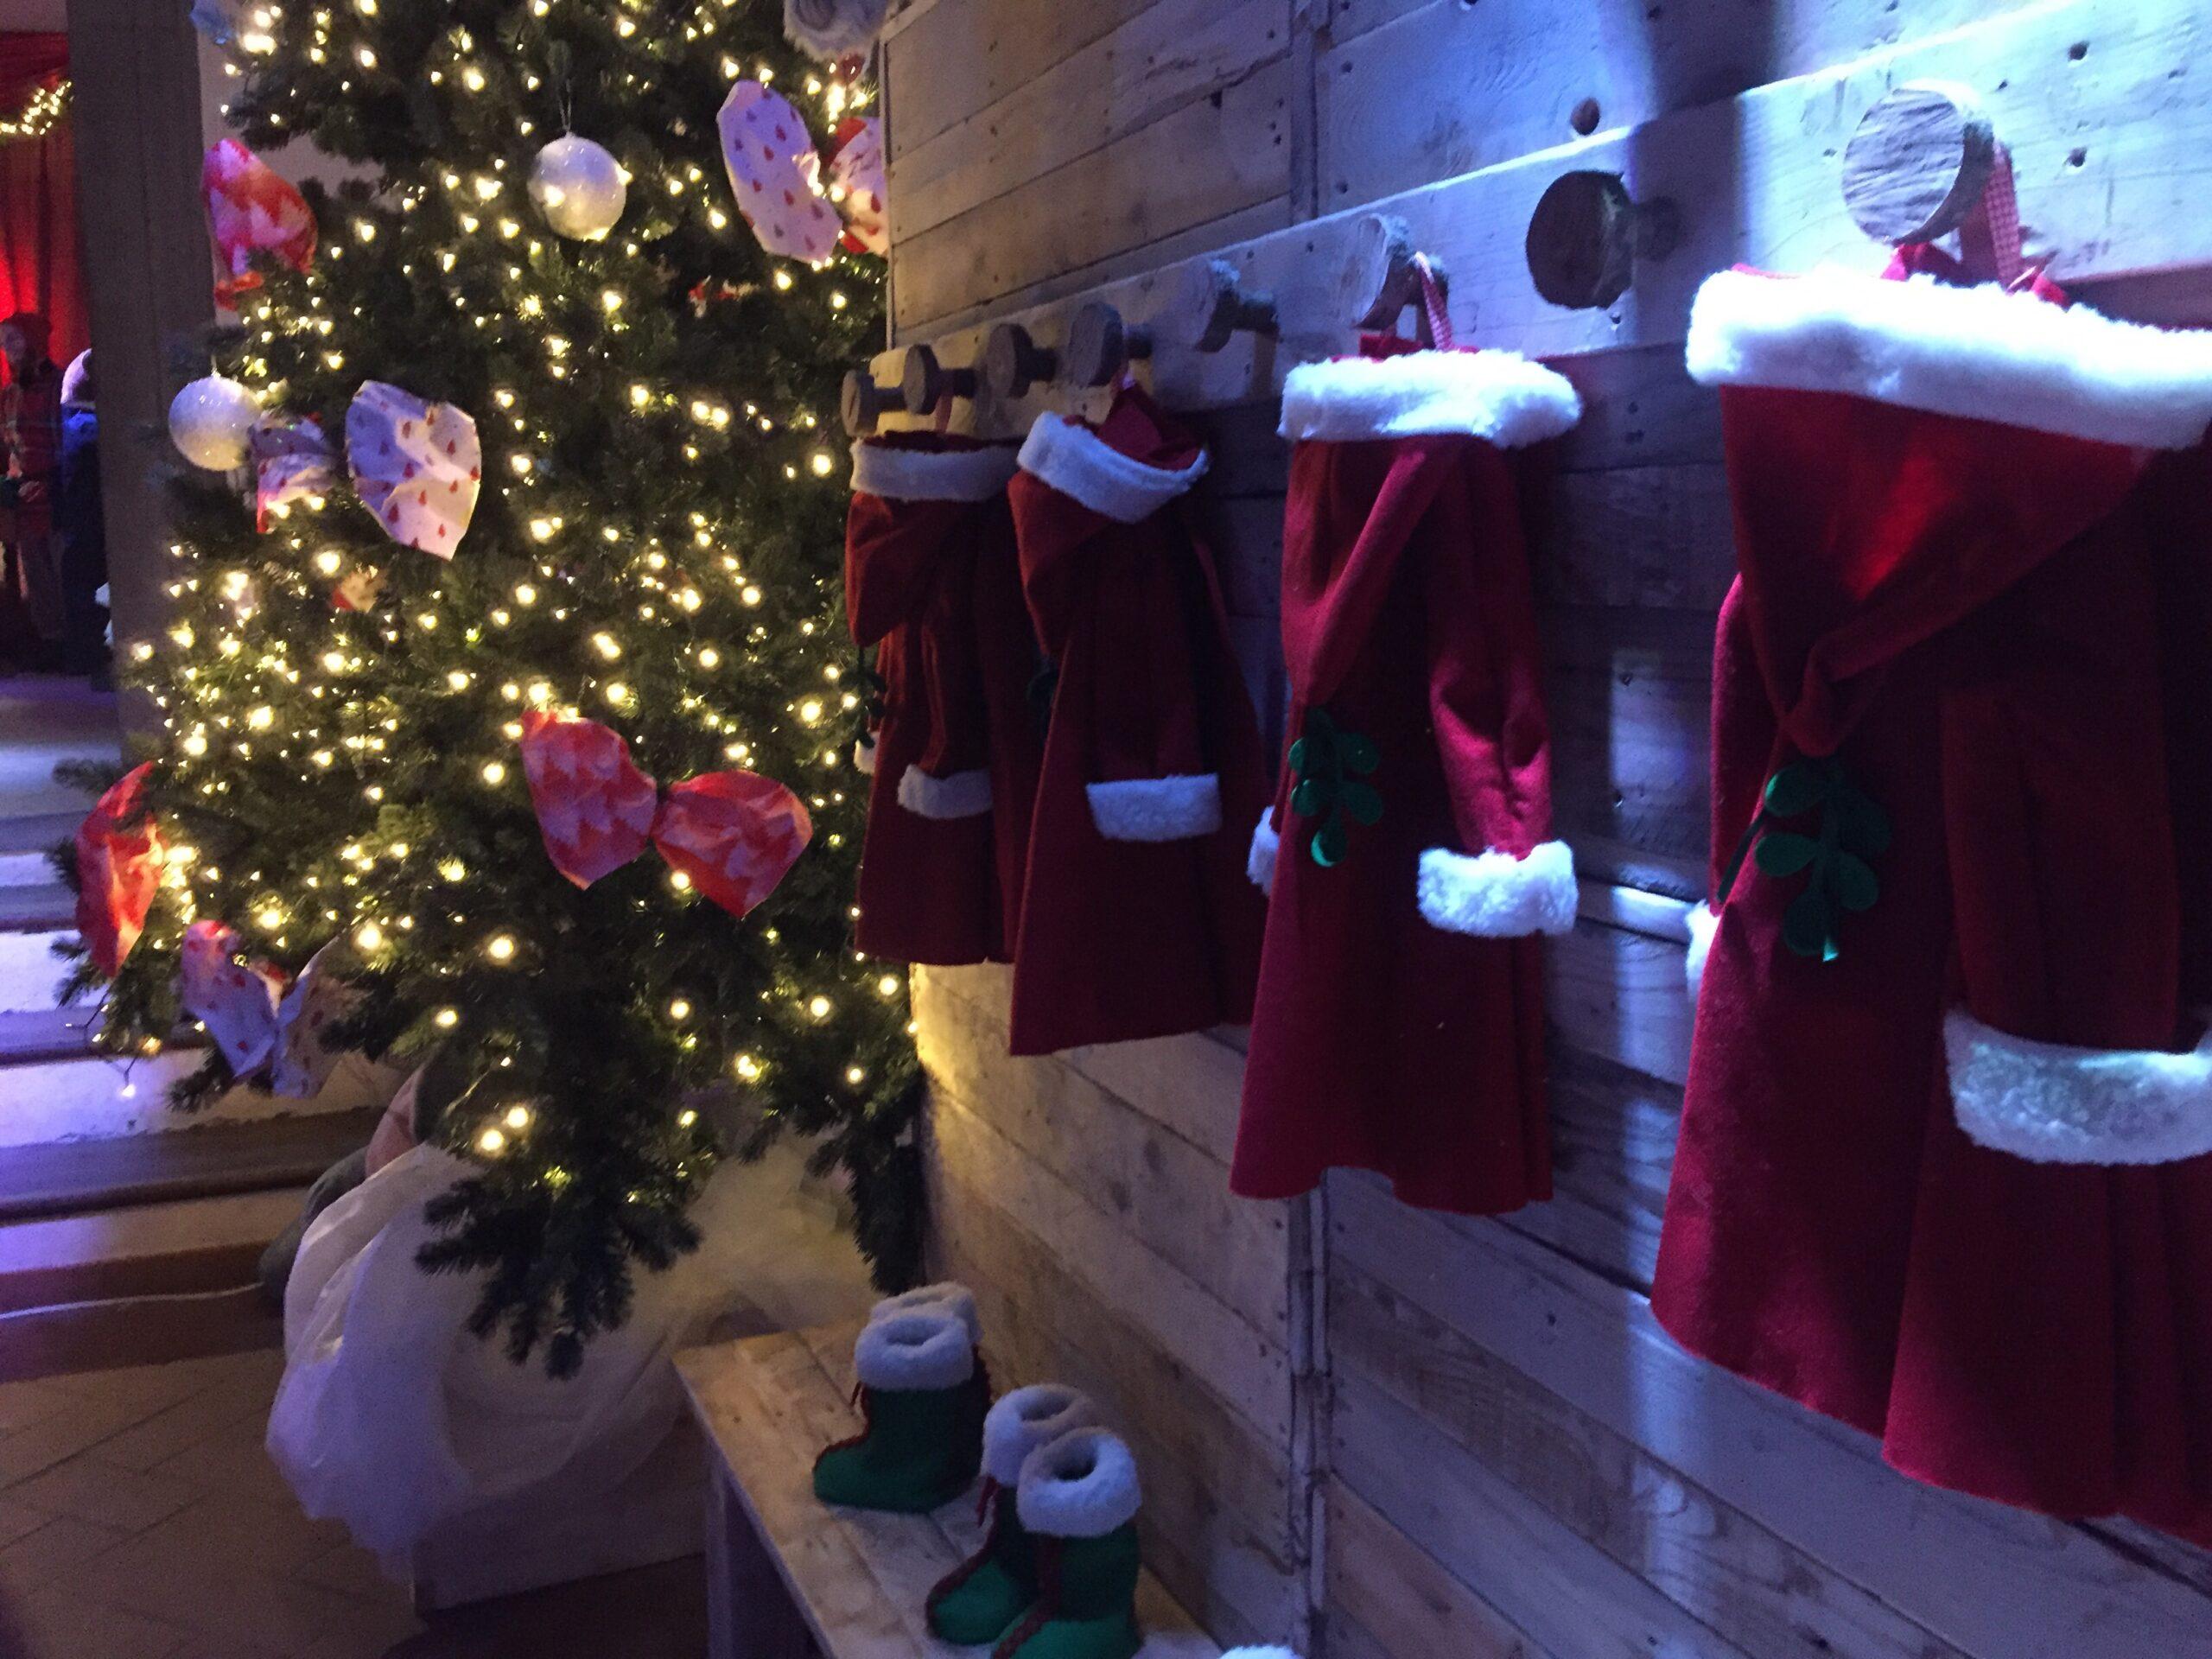 Natale a Viterbo con mercatini e Christmas Village!